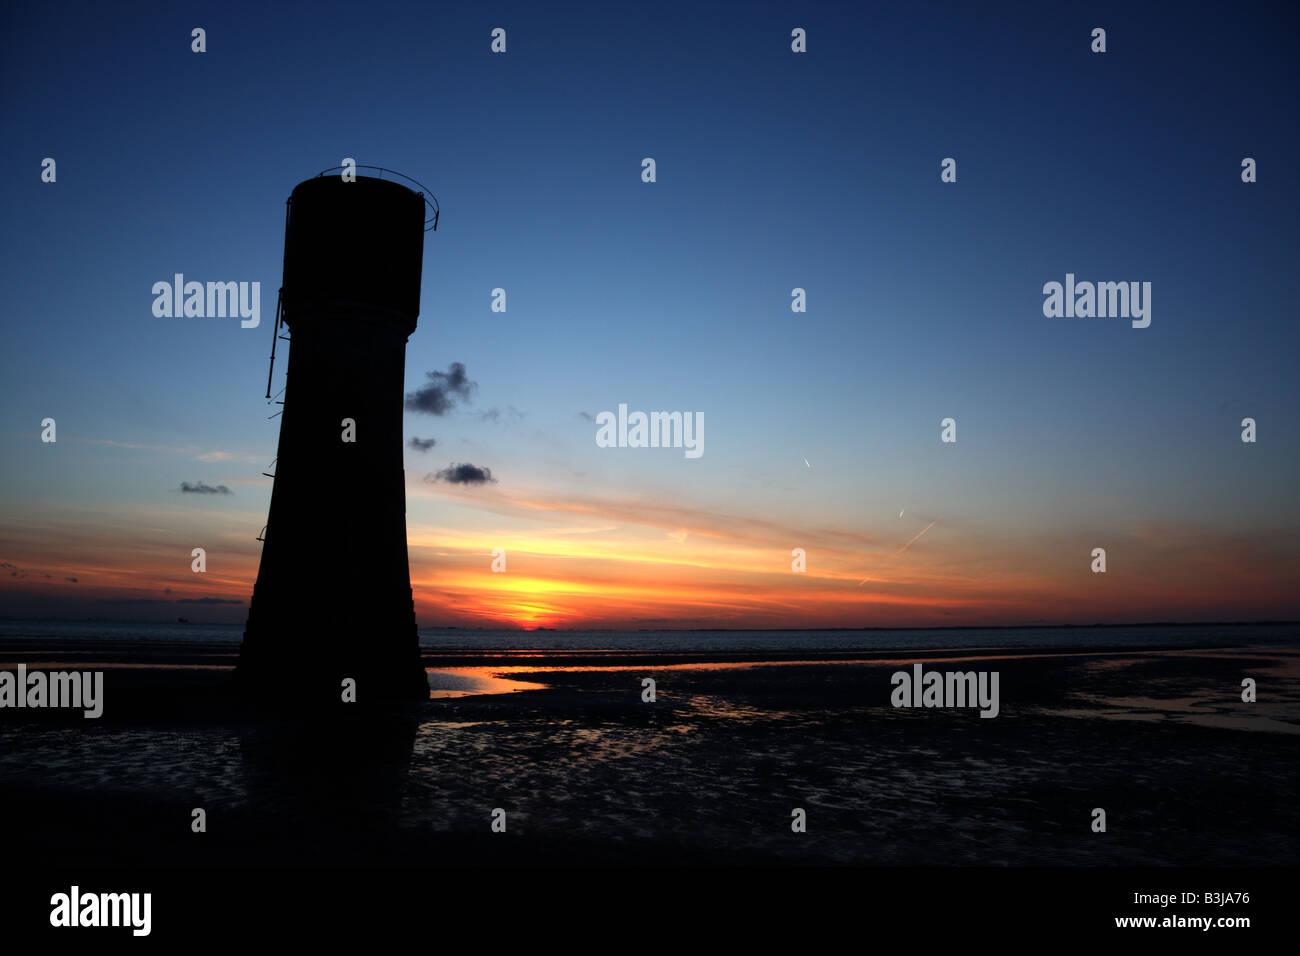 Spurn Head lowlight at sunset. - Stock Image